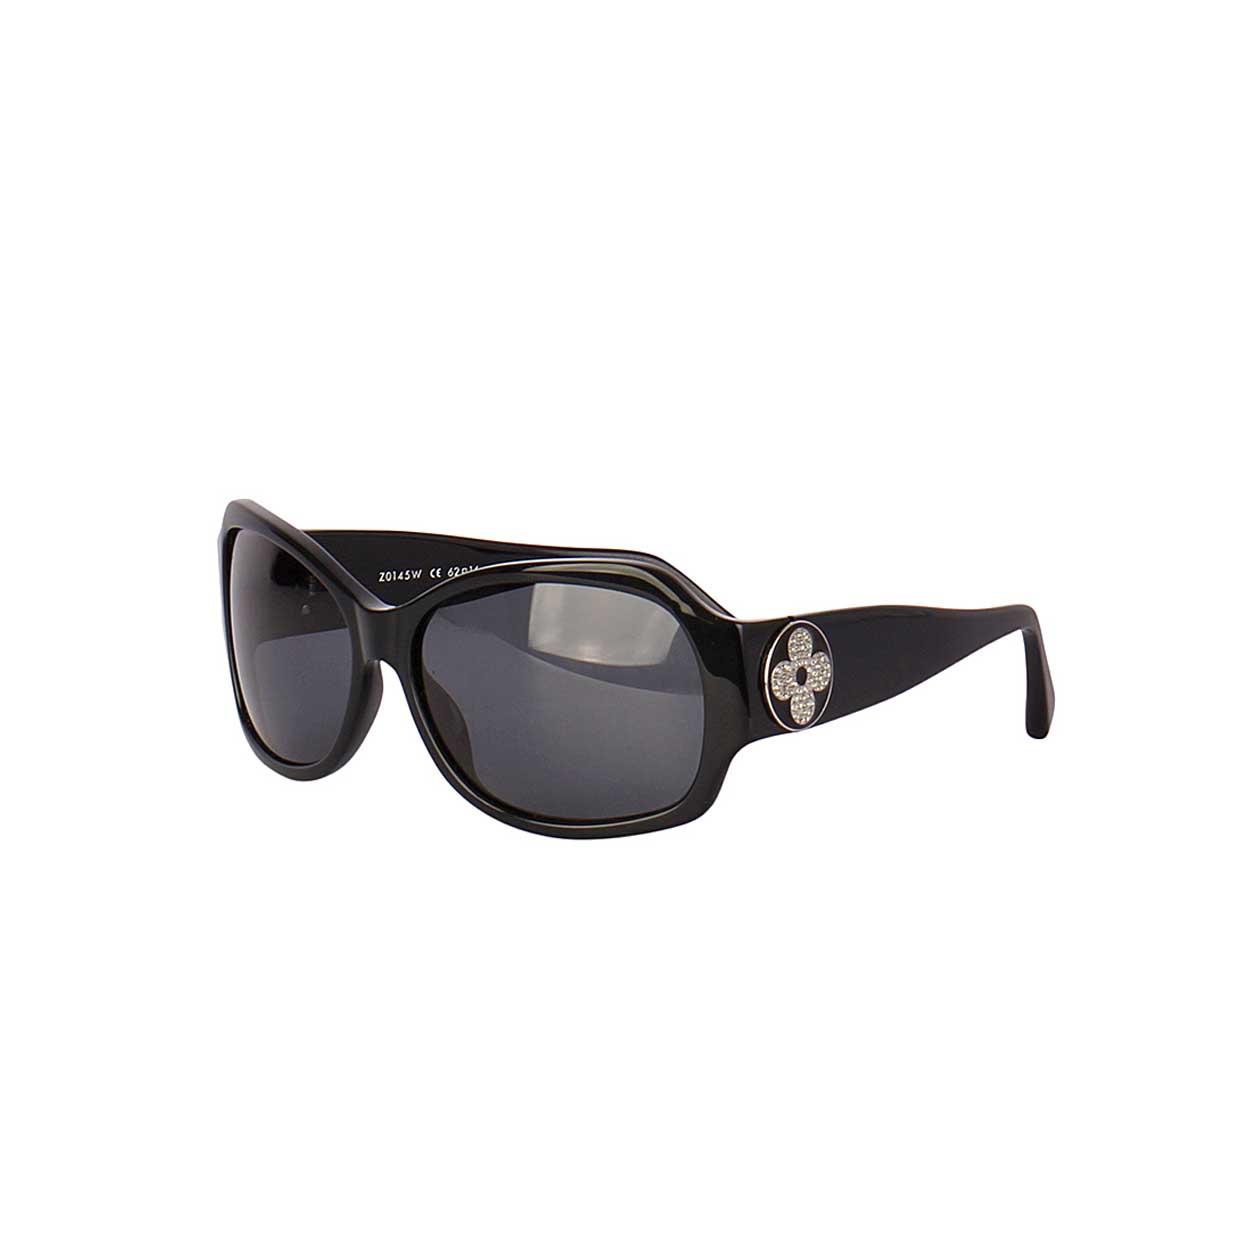 60d26eb8e31f Louis Vuitton Sunglasses Women 2017